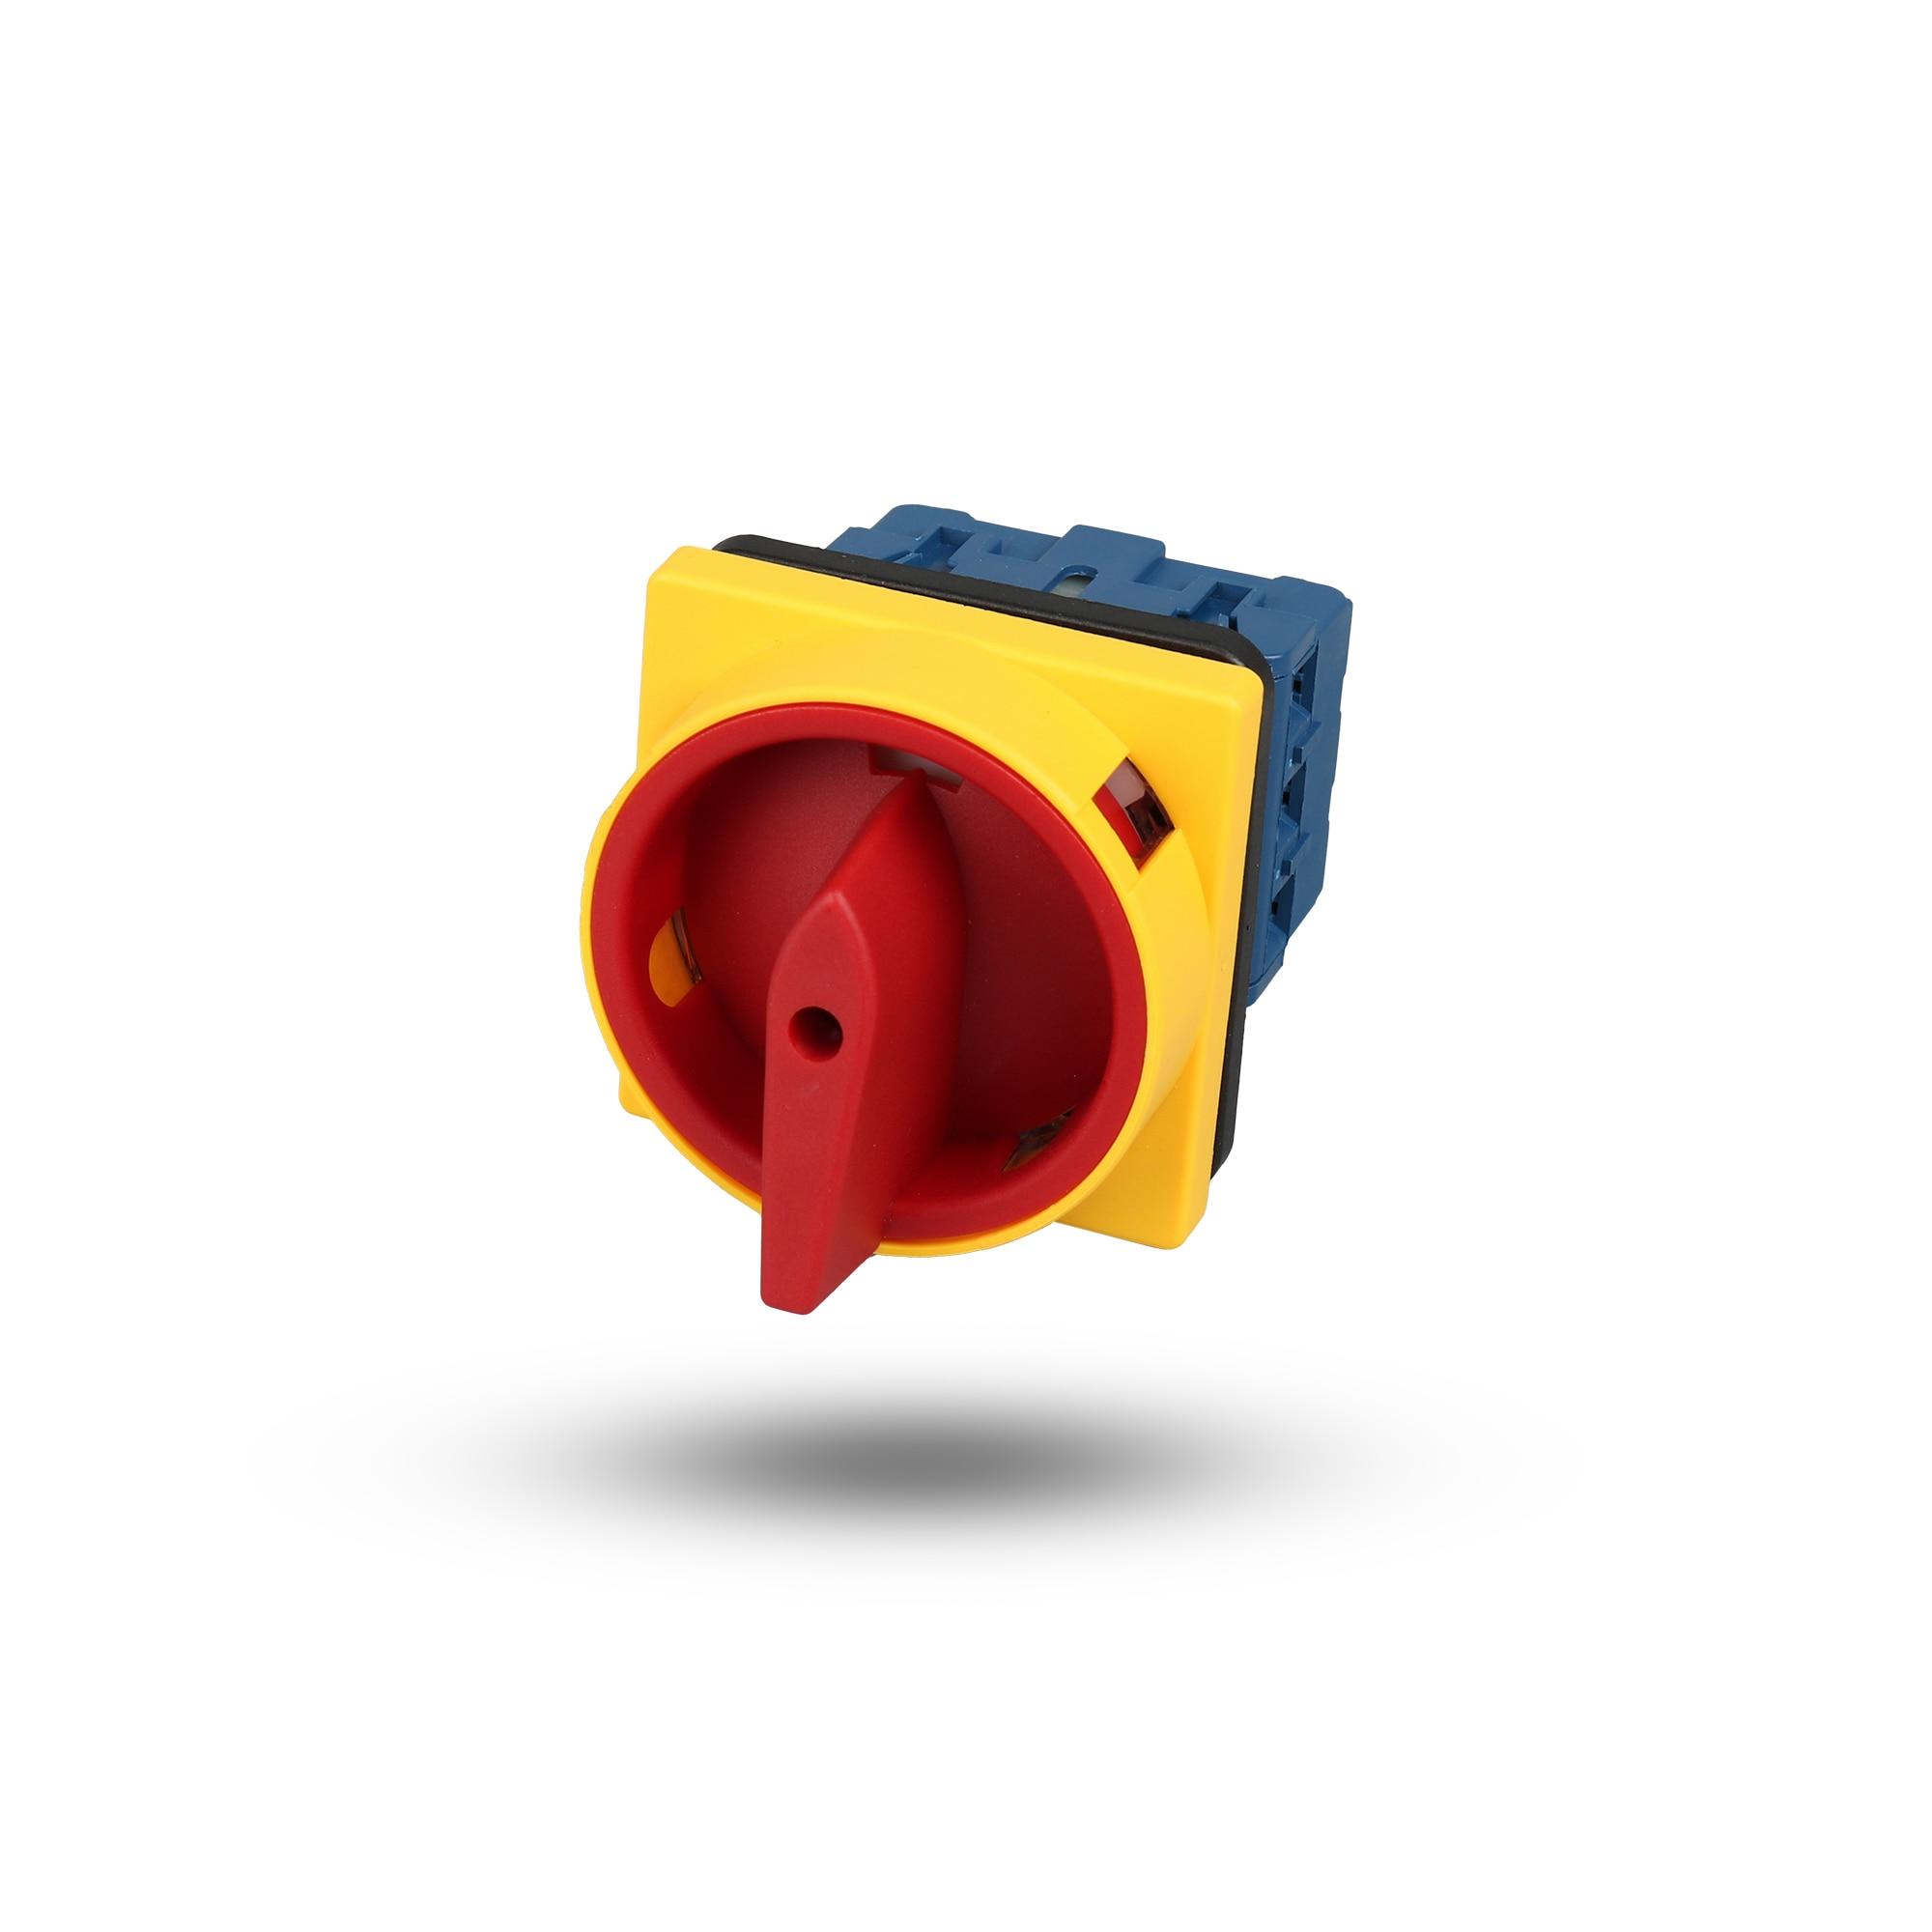 Interruptor de cámara Ue 440V con 20A aislar aislador interruptor de 3 polos (CE CCC TUV certificado) 300010